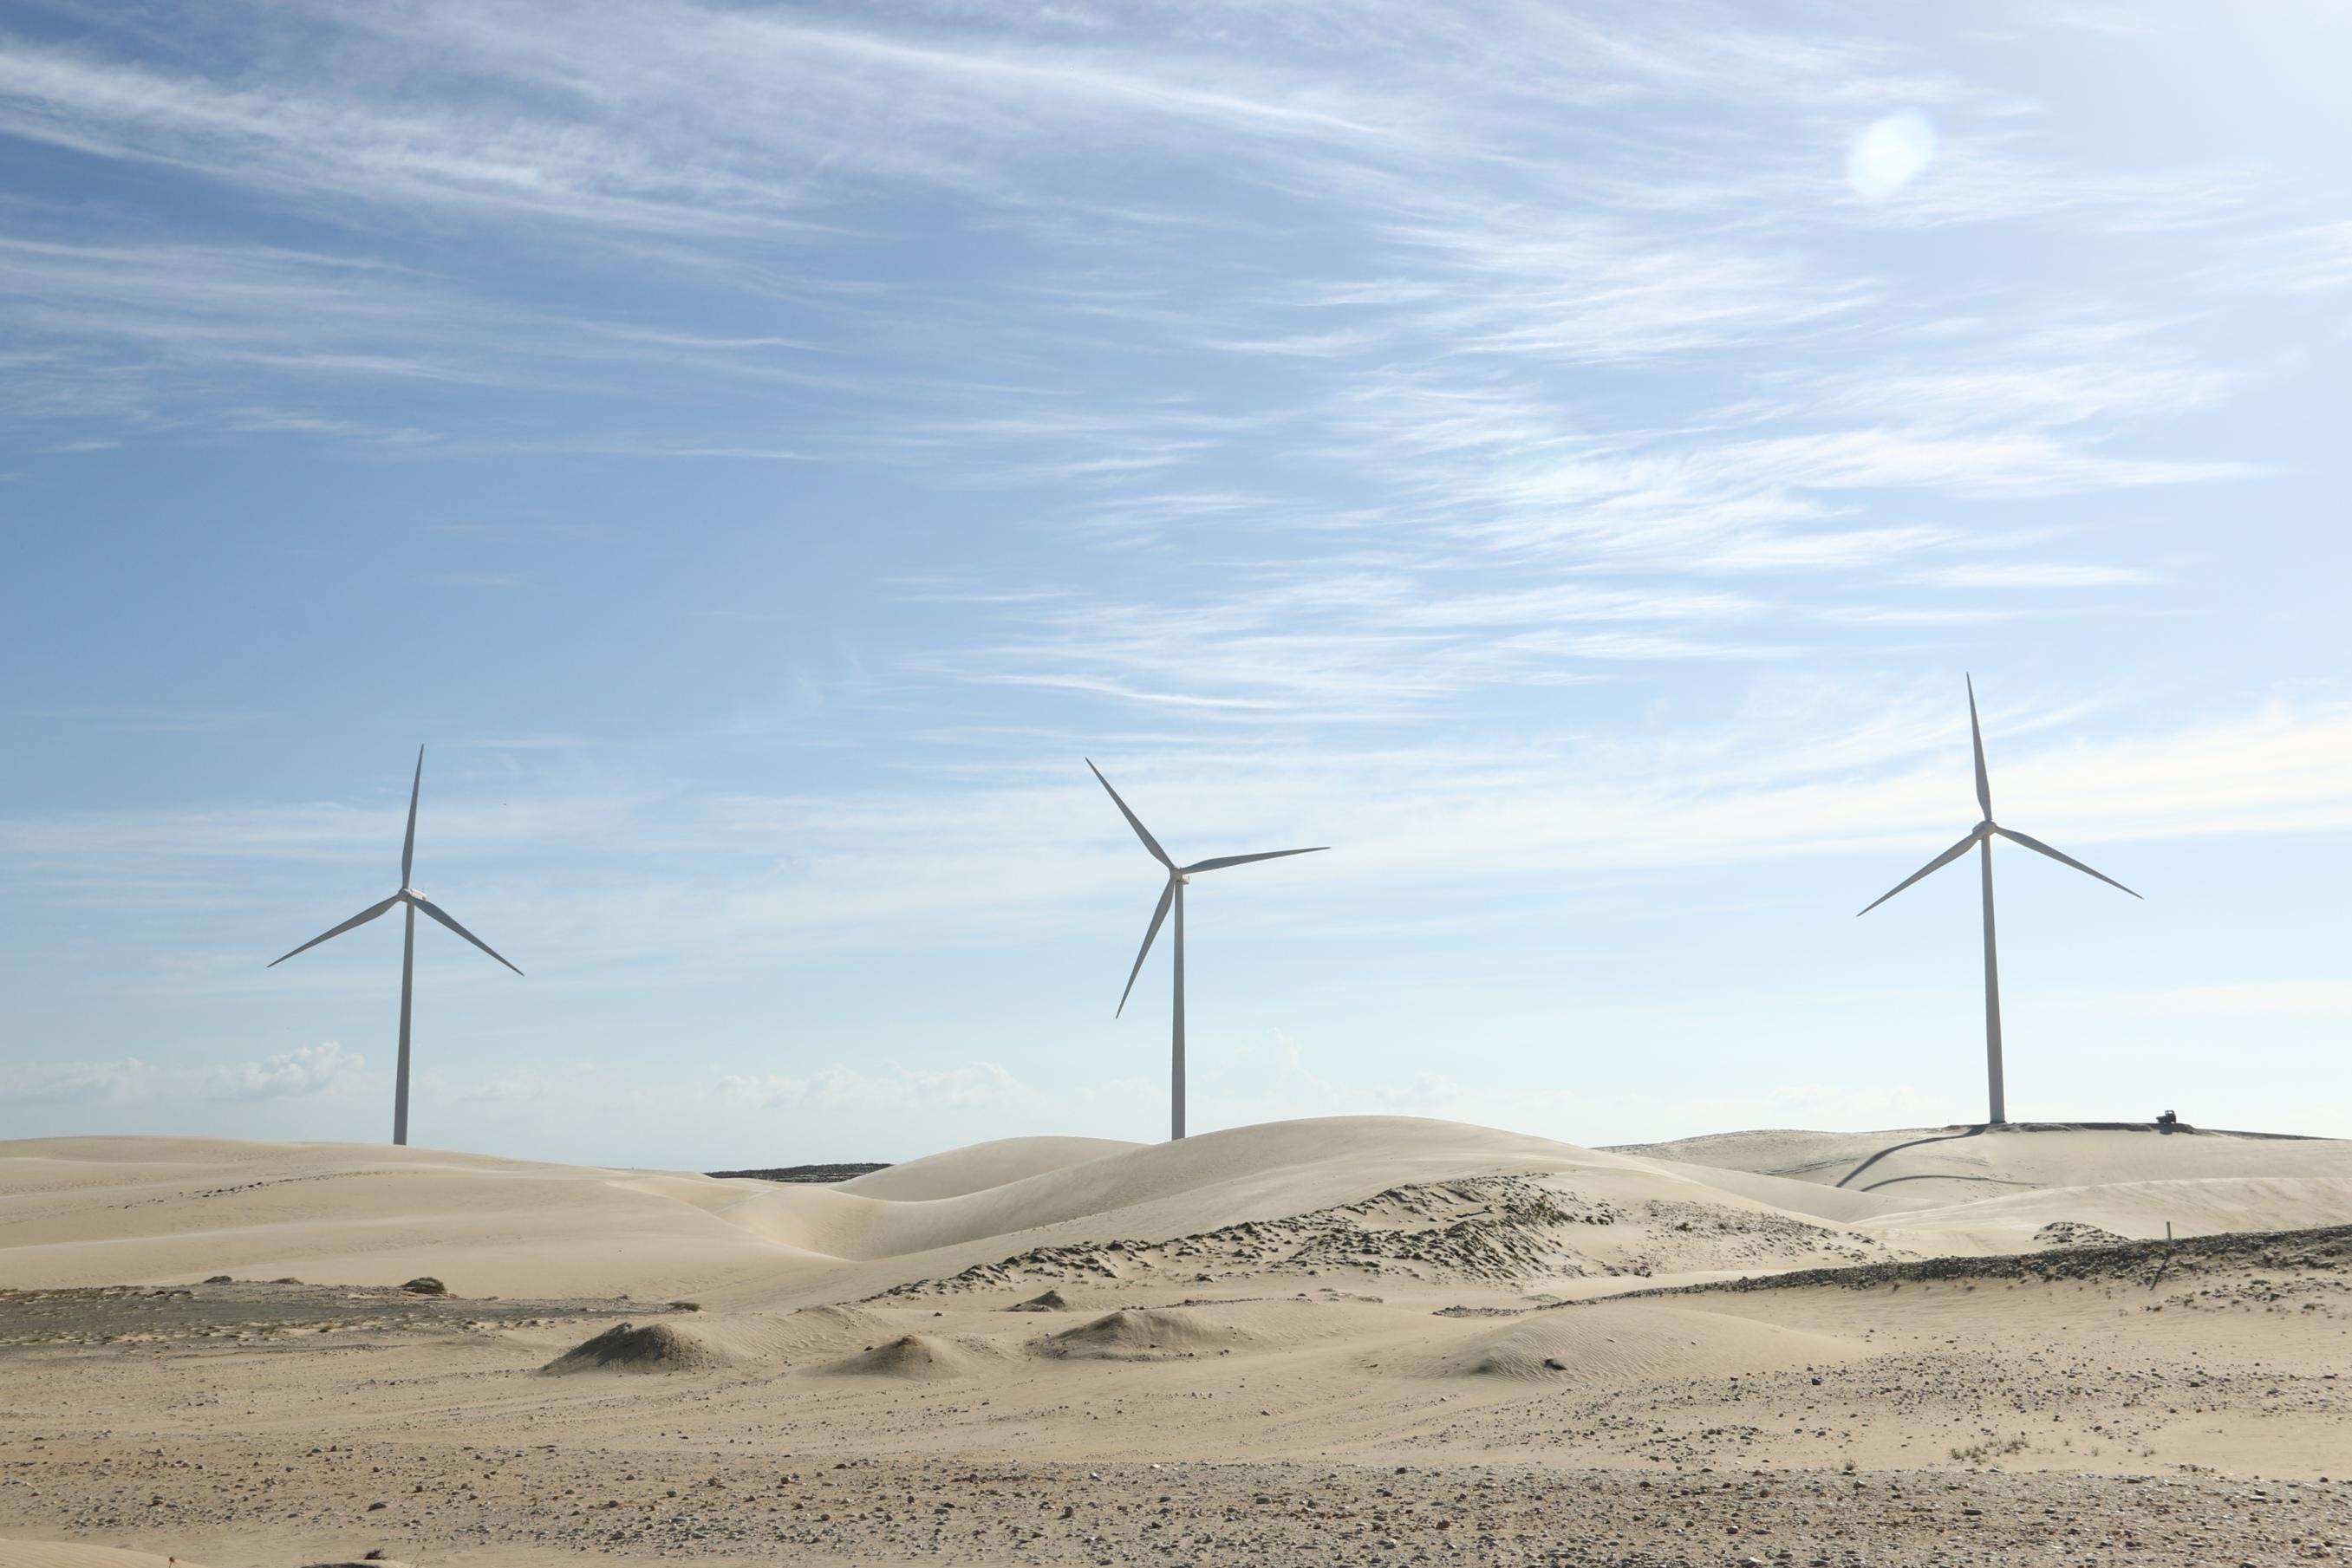 Wind-farm-Gamesa Gamesa Chosen To Build Two Wind Farms In Egypt